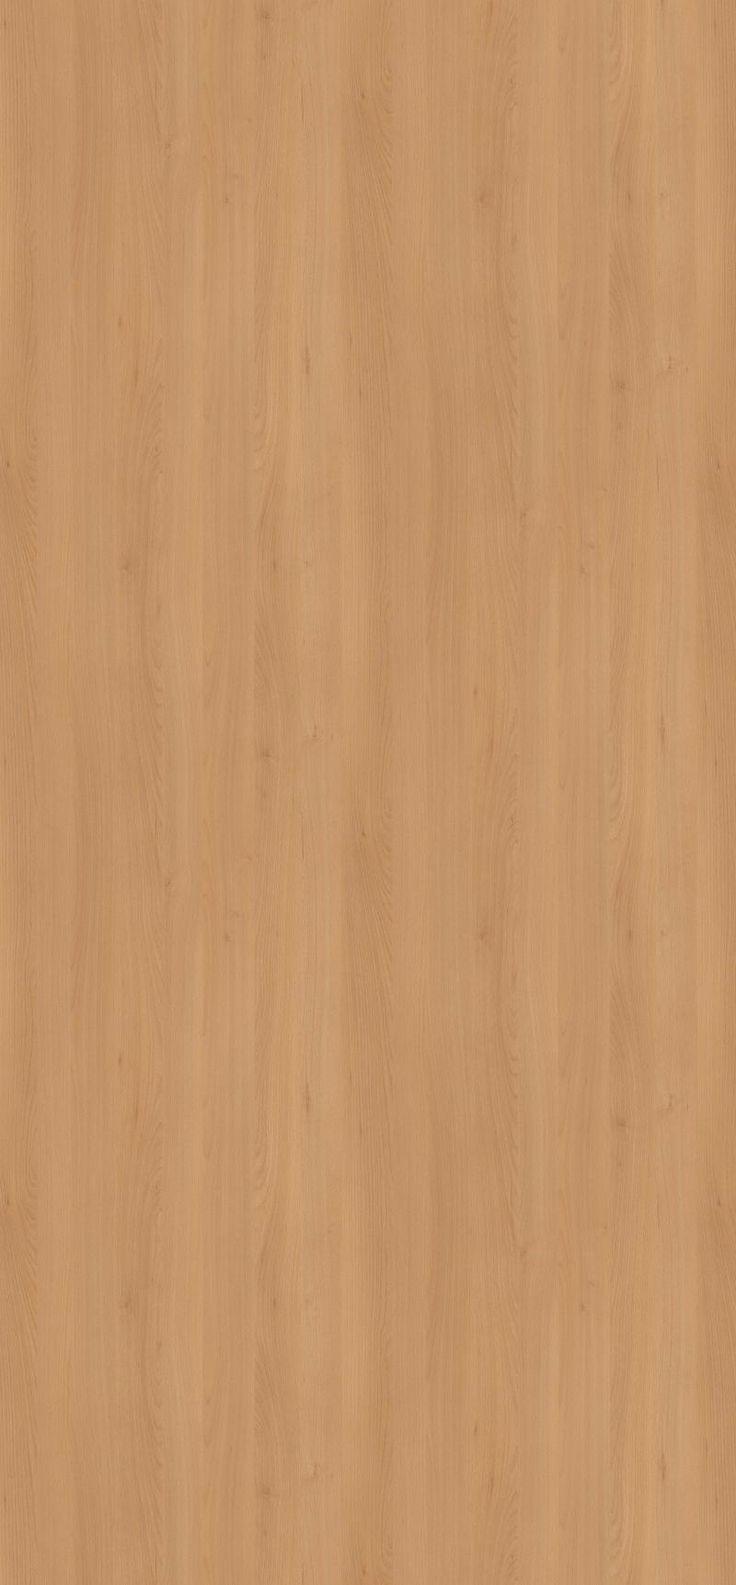 Tauren natúr bükk bútorlap H 3911 ST 9 EGGER